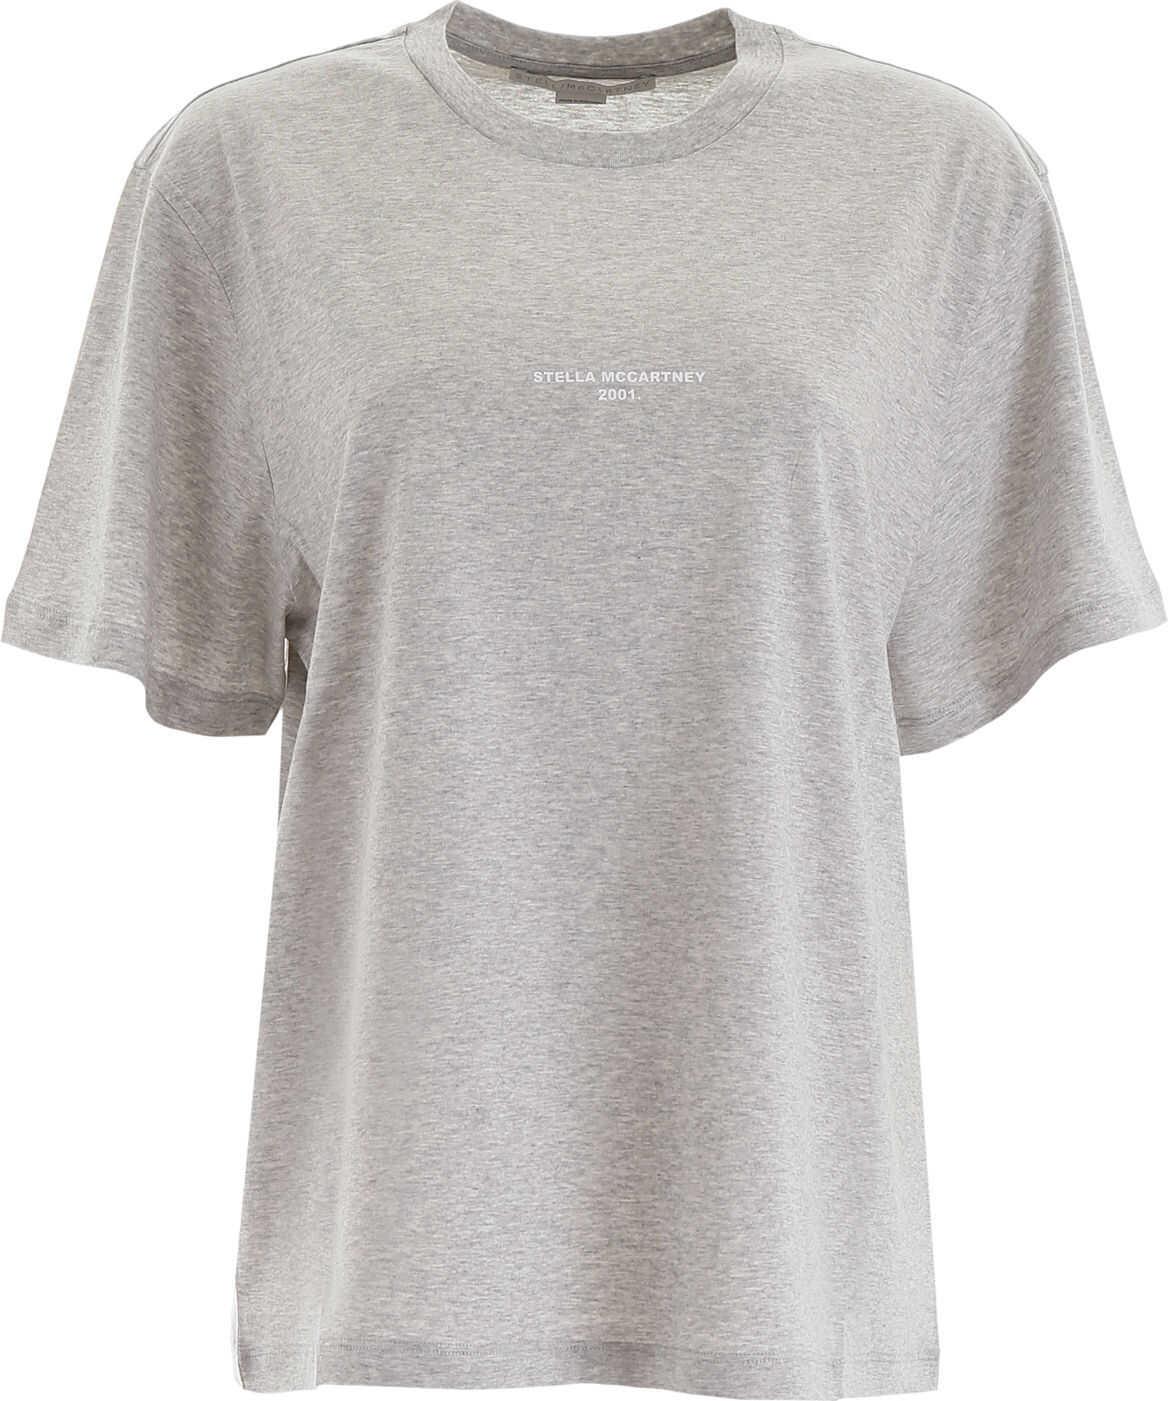 adidas by Stella McCartney Logo Print T-Shirt GREY MELANGE